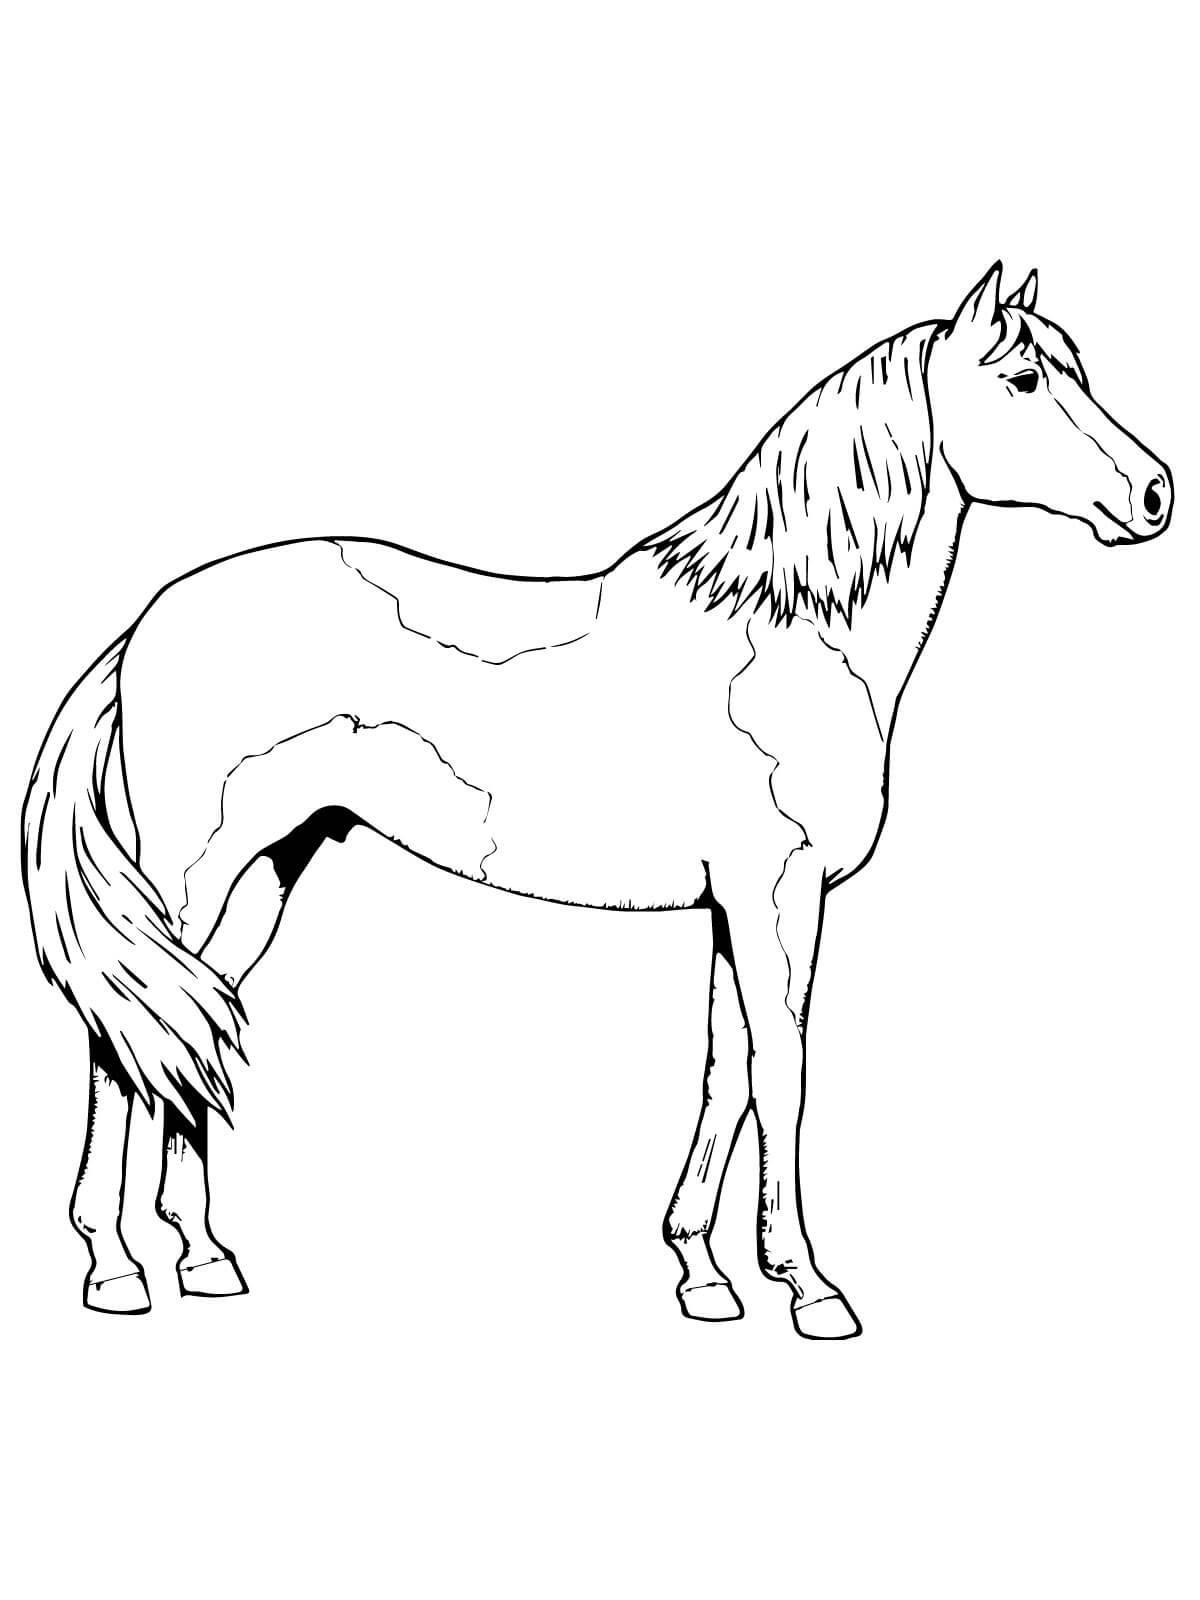 Horse Color Sheet for Kids | Activity Shelter